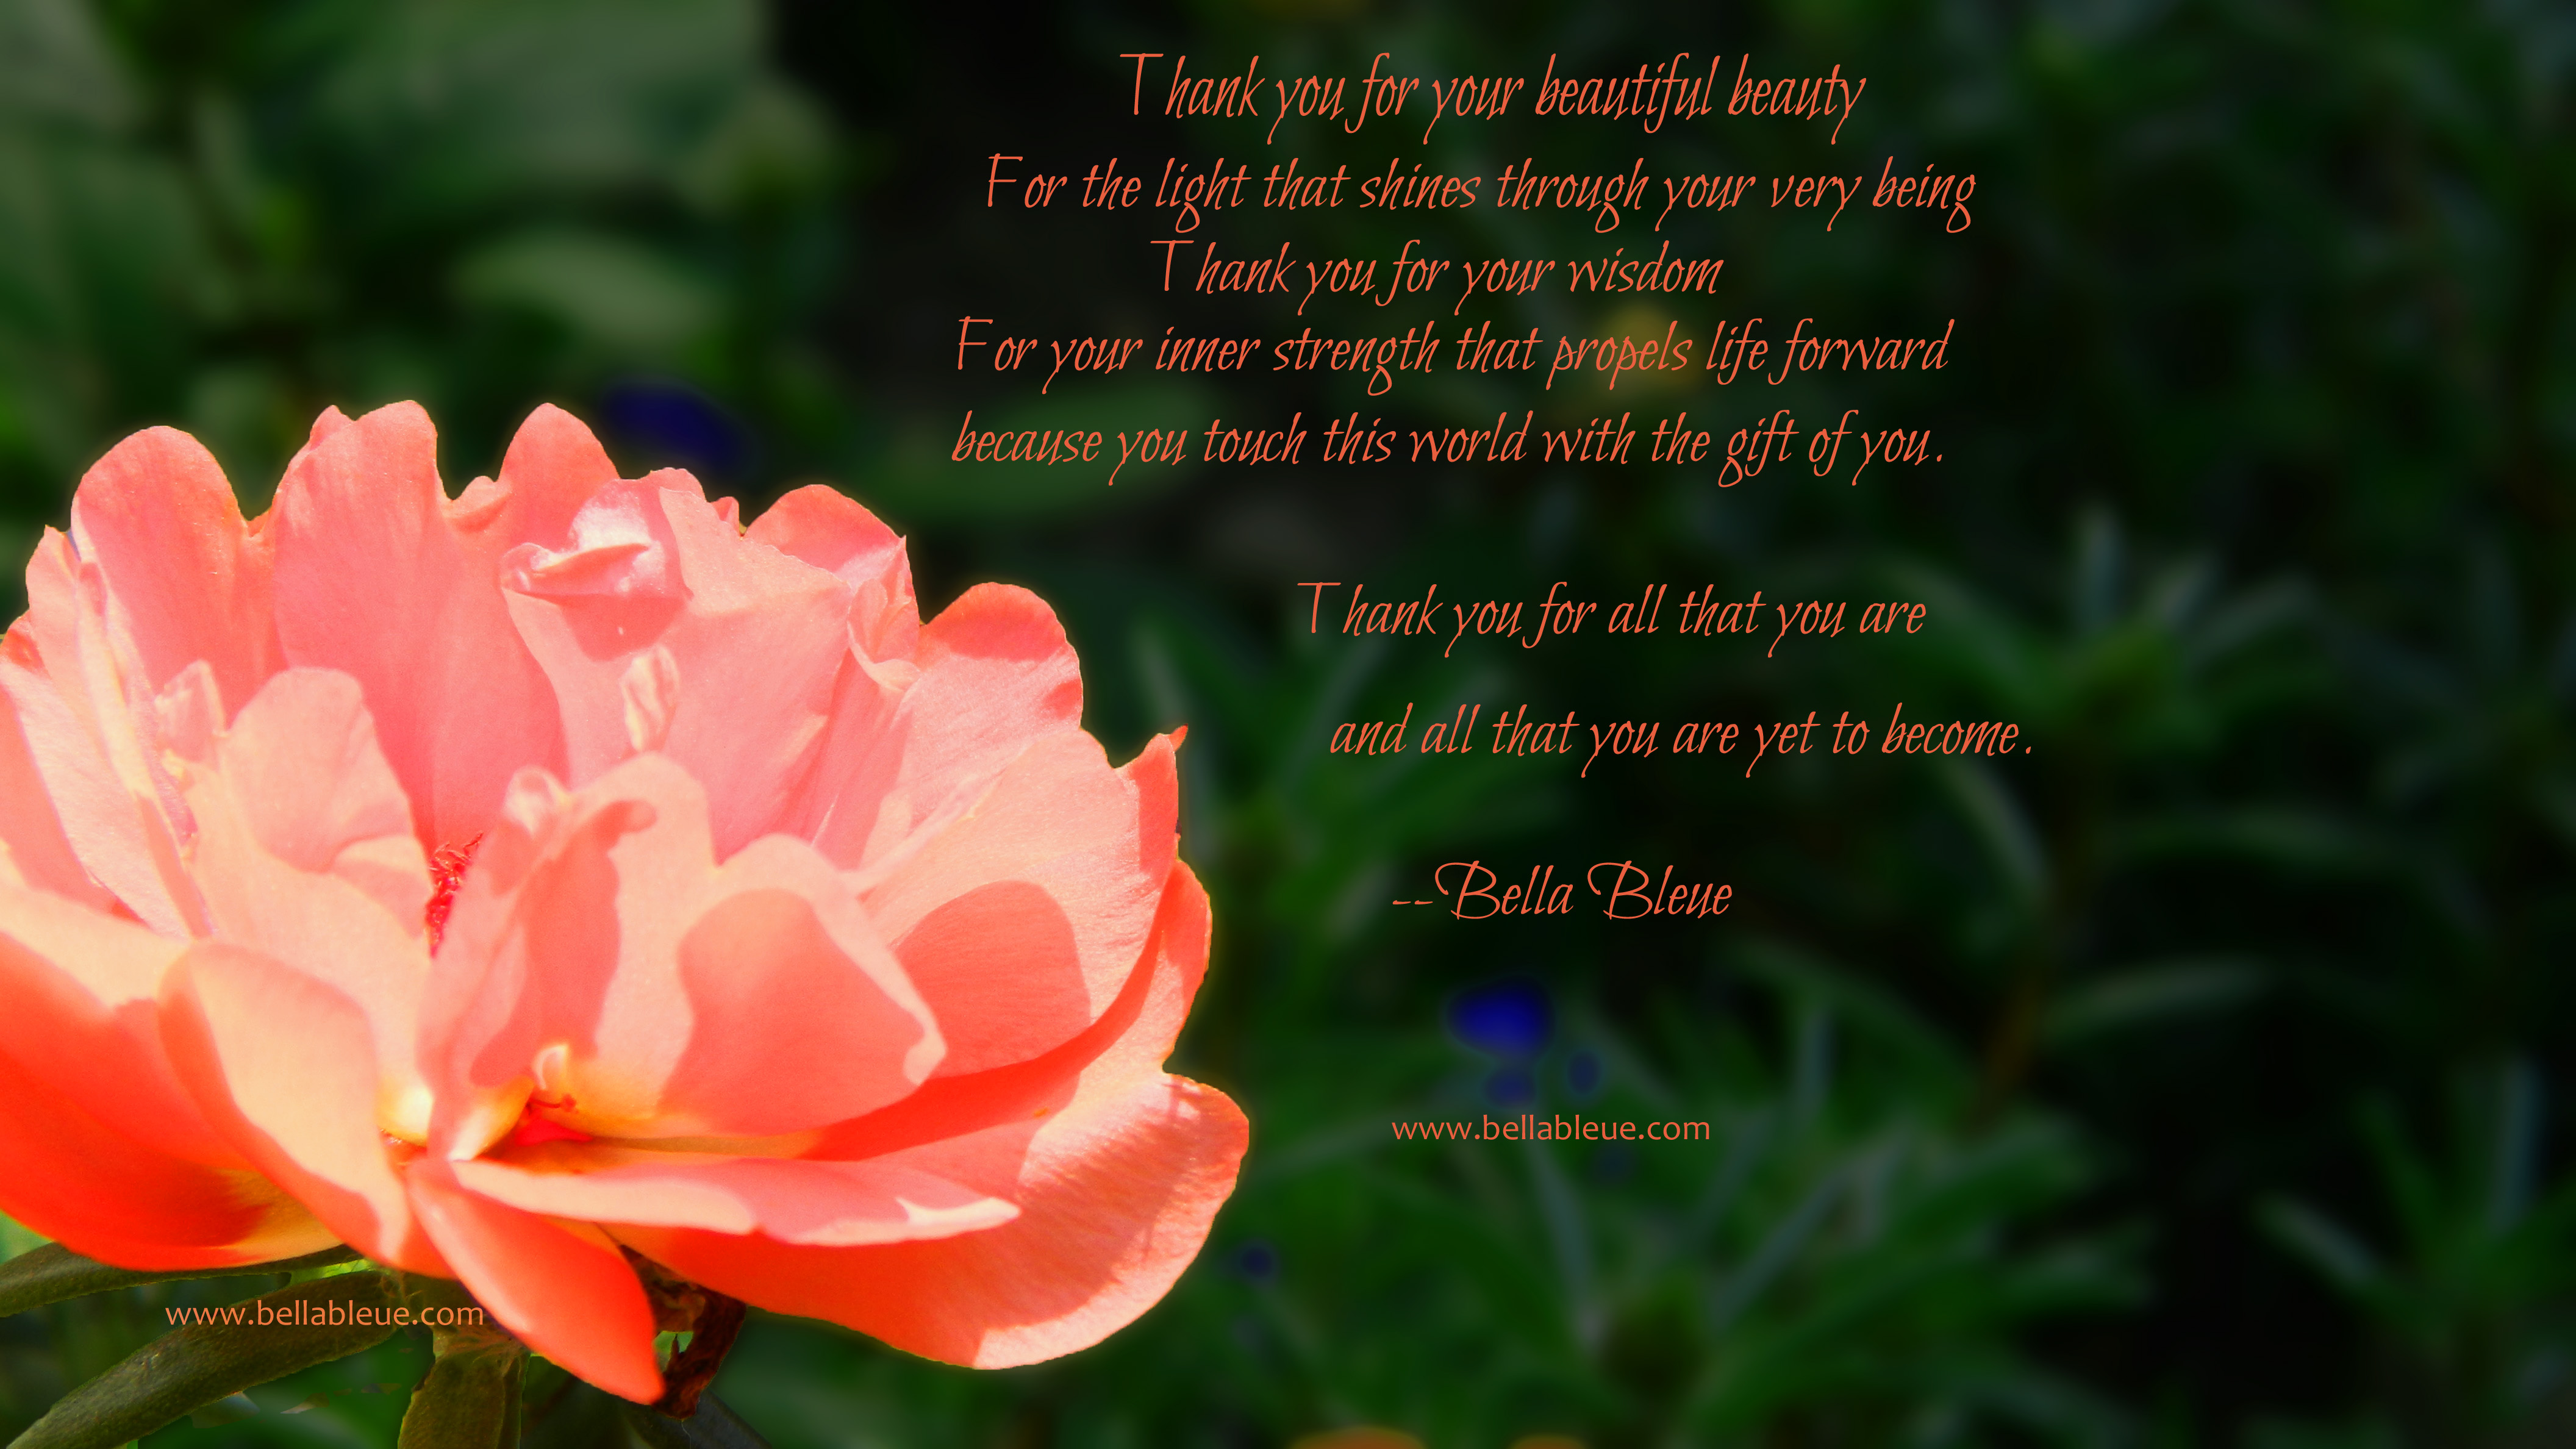 Beauty Poem by Bella Bleue